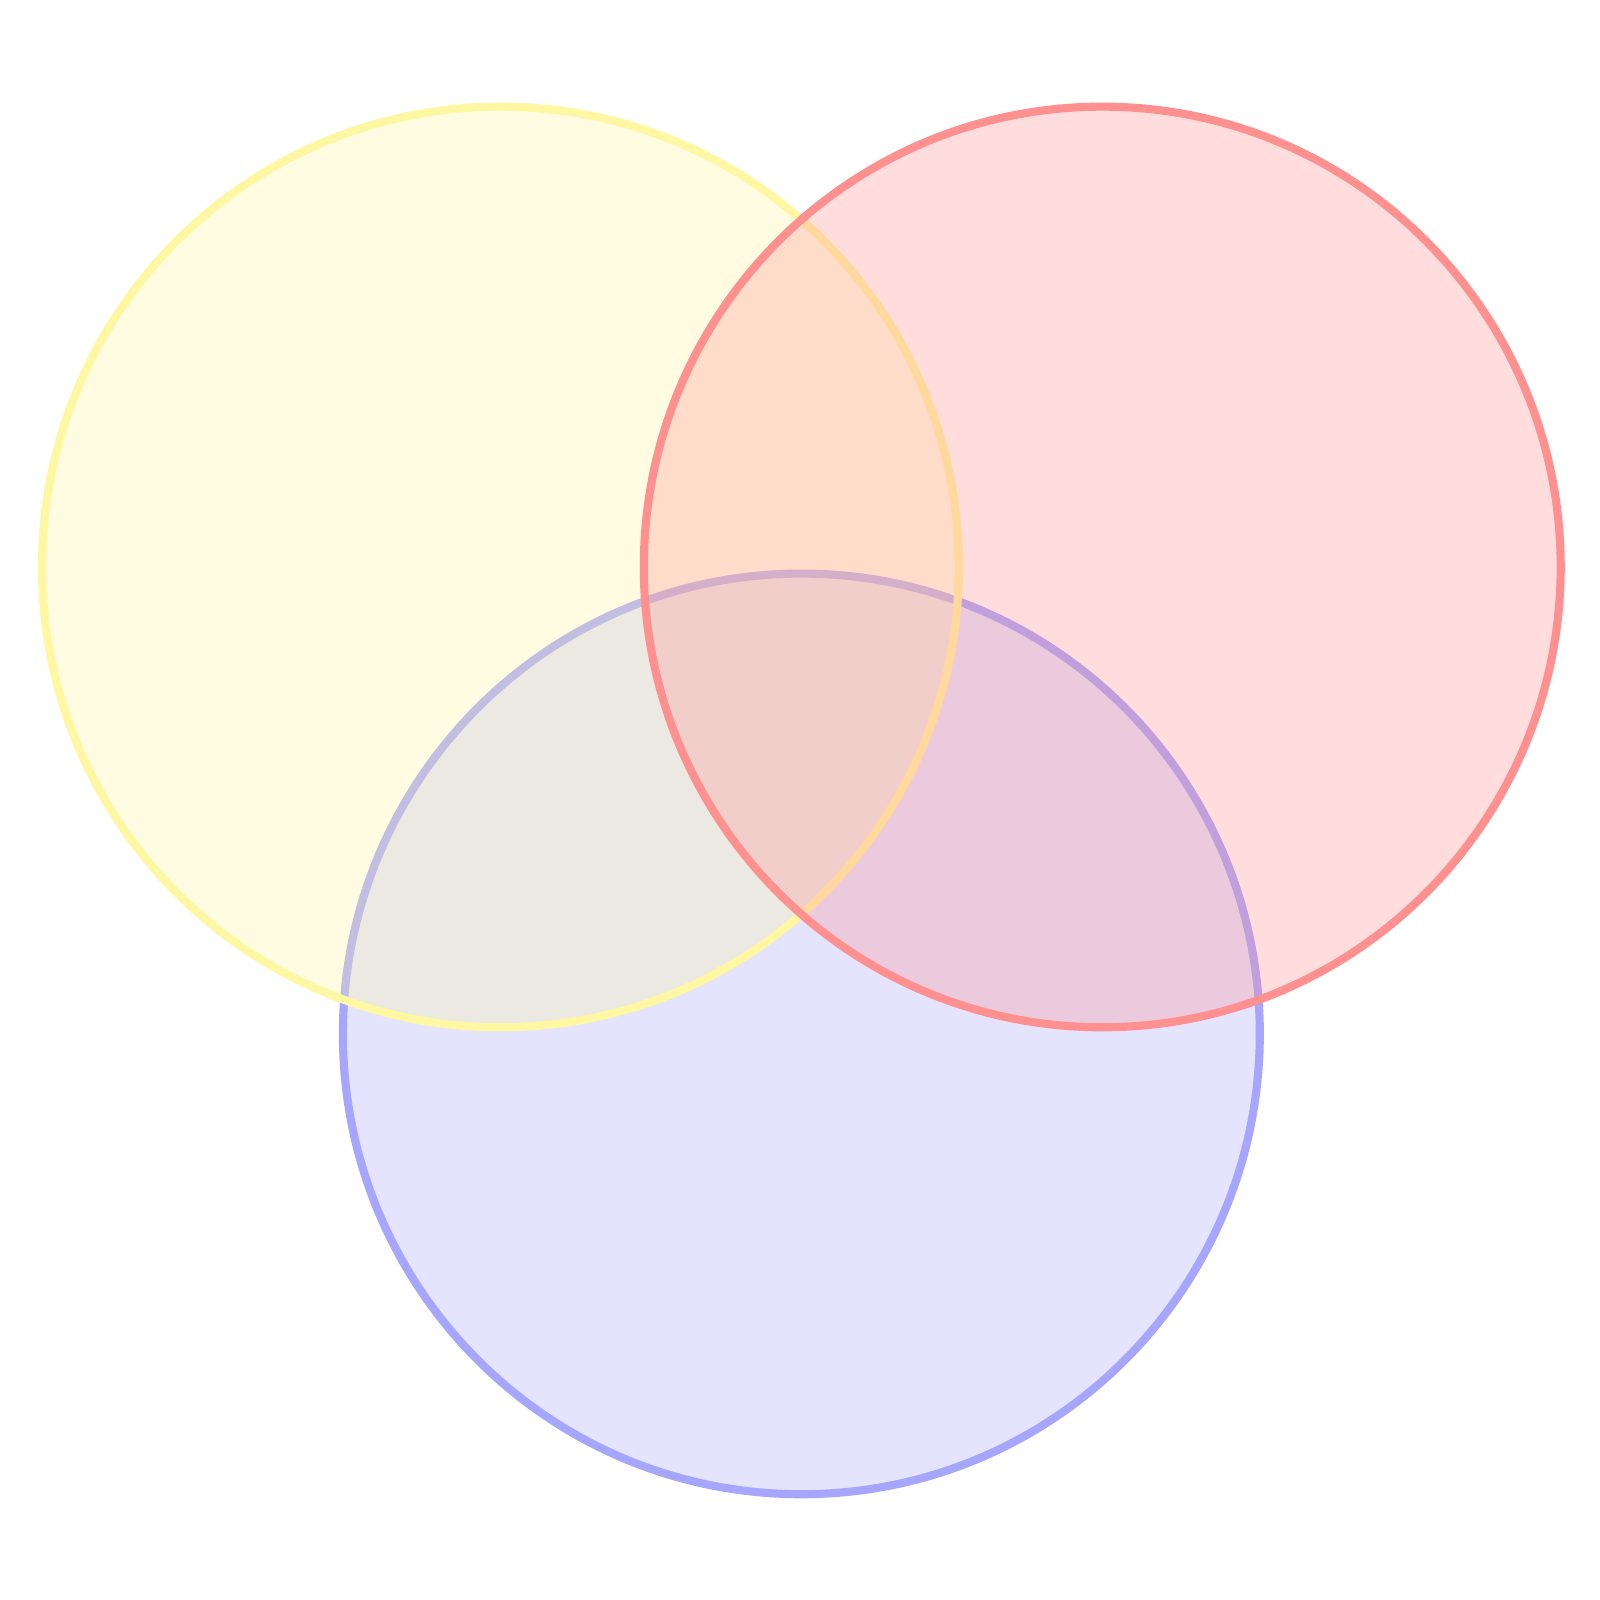 3 circle venn diagram